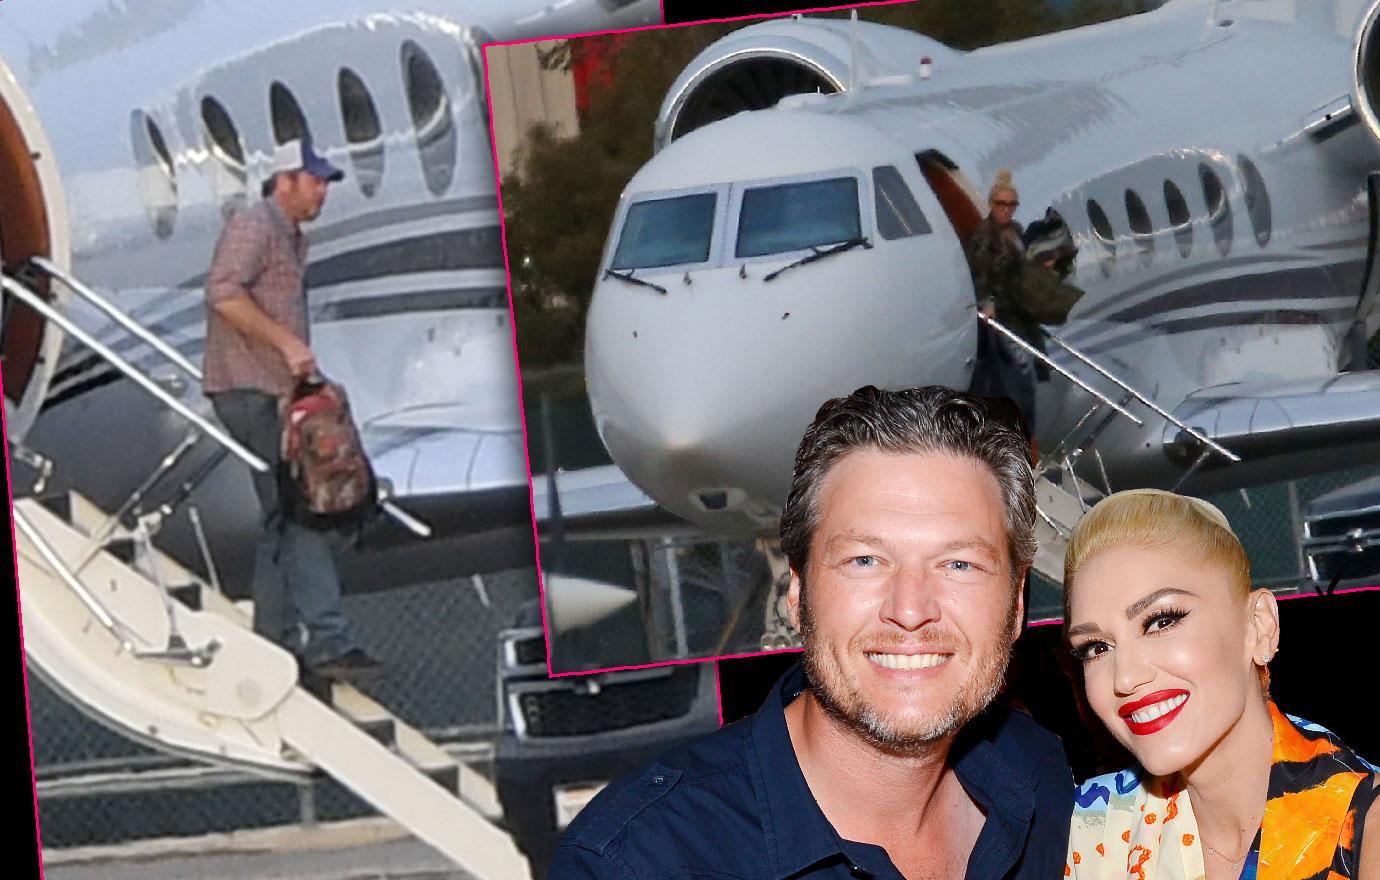 Gwen Stefani Blake Shelton Fly On Private Jet Before Easter